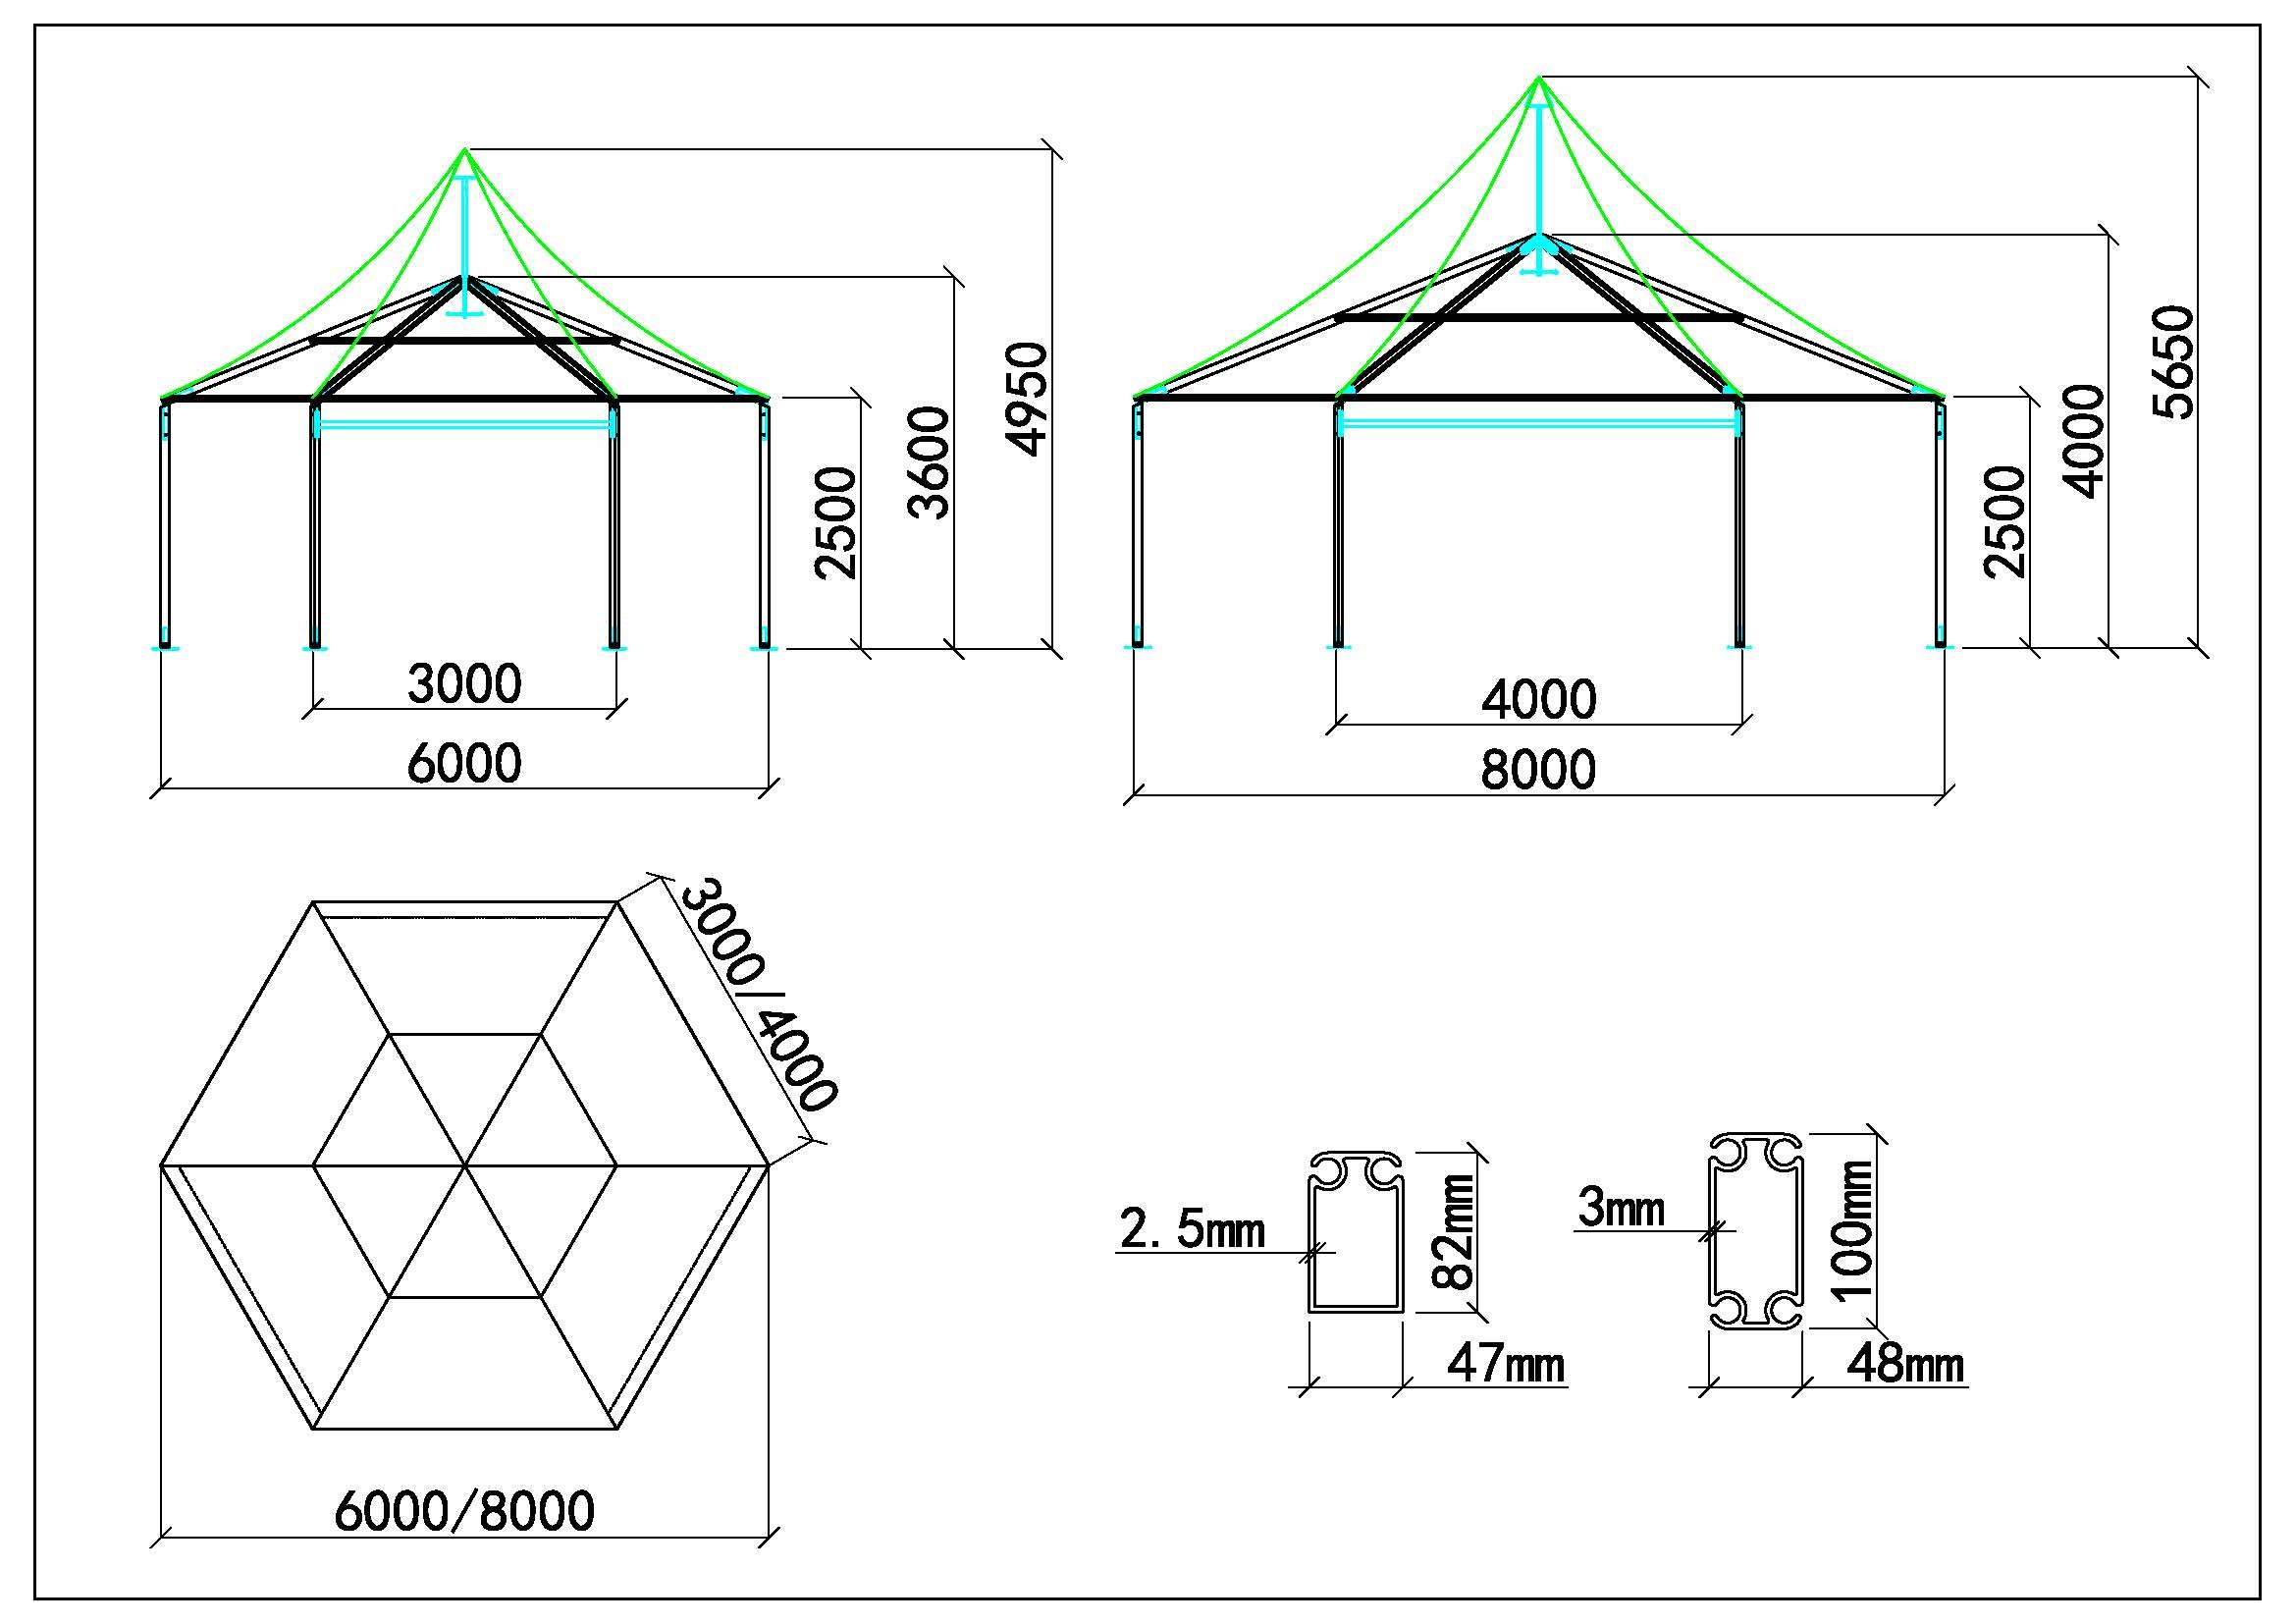 Polygone tente 6-8m